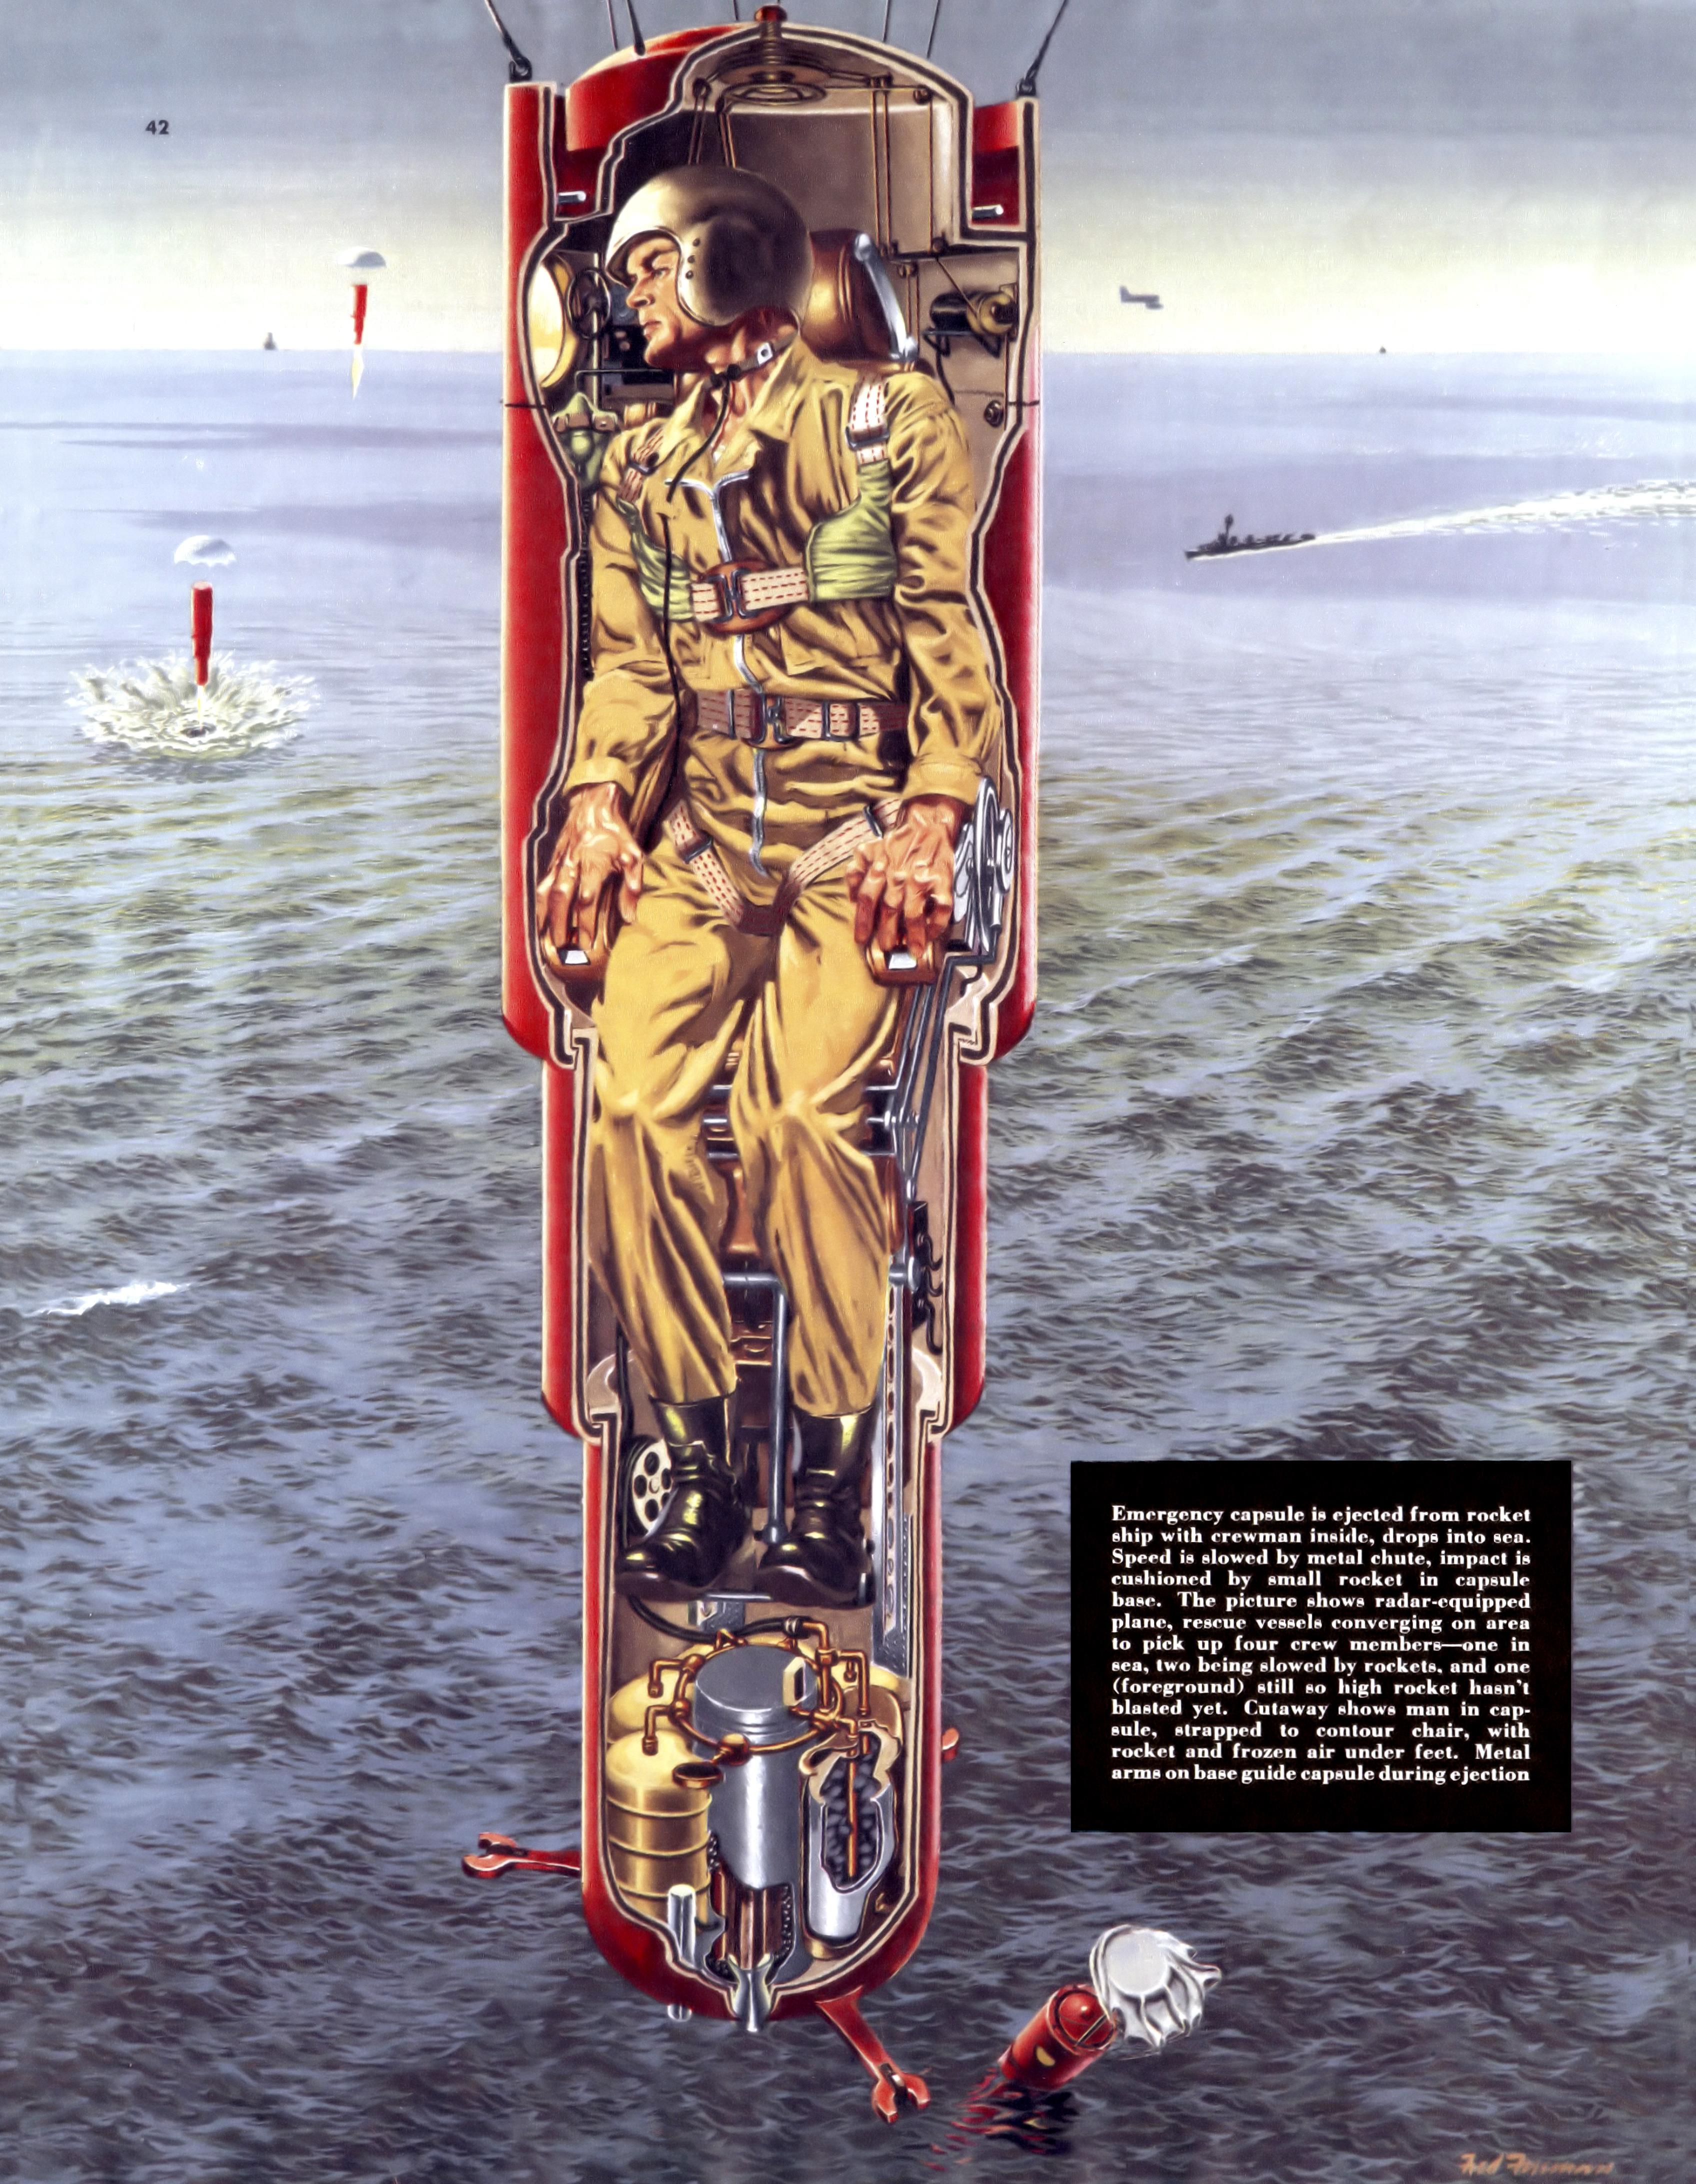 Collier 3.14.1953-p.43-Emergency in space travel.jpg